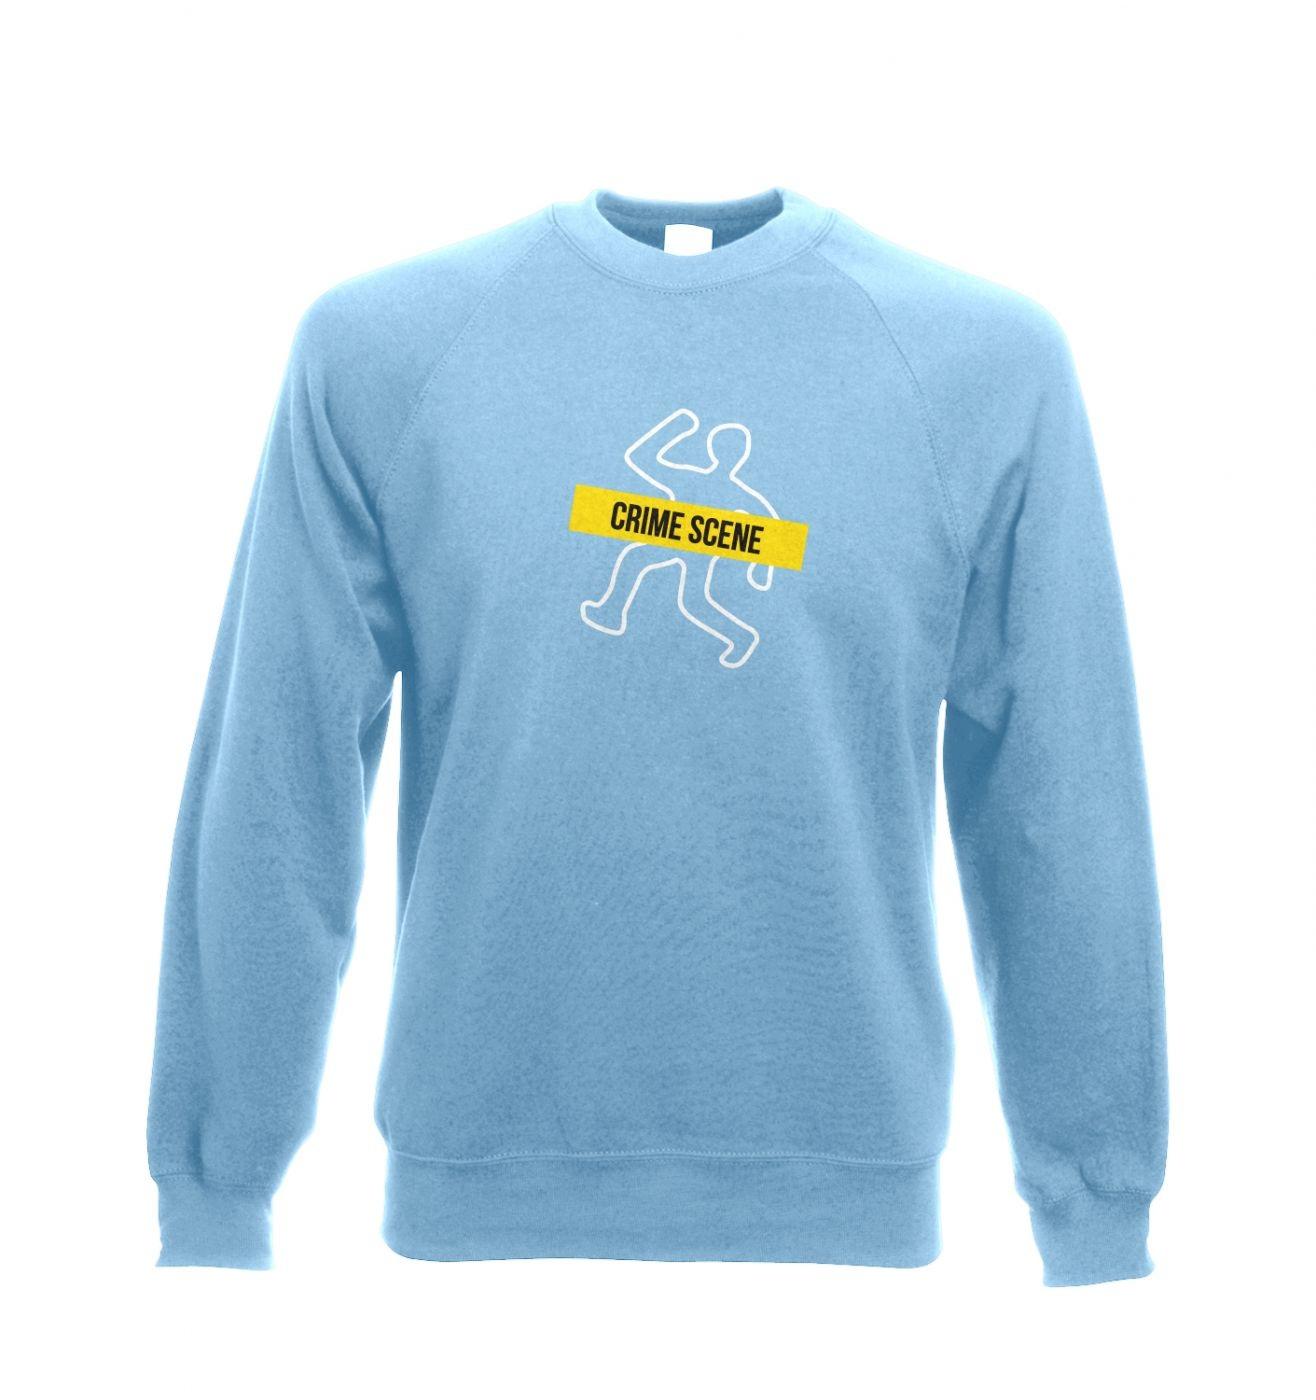 Crime Scene Adult Crewneck Sweatshirt